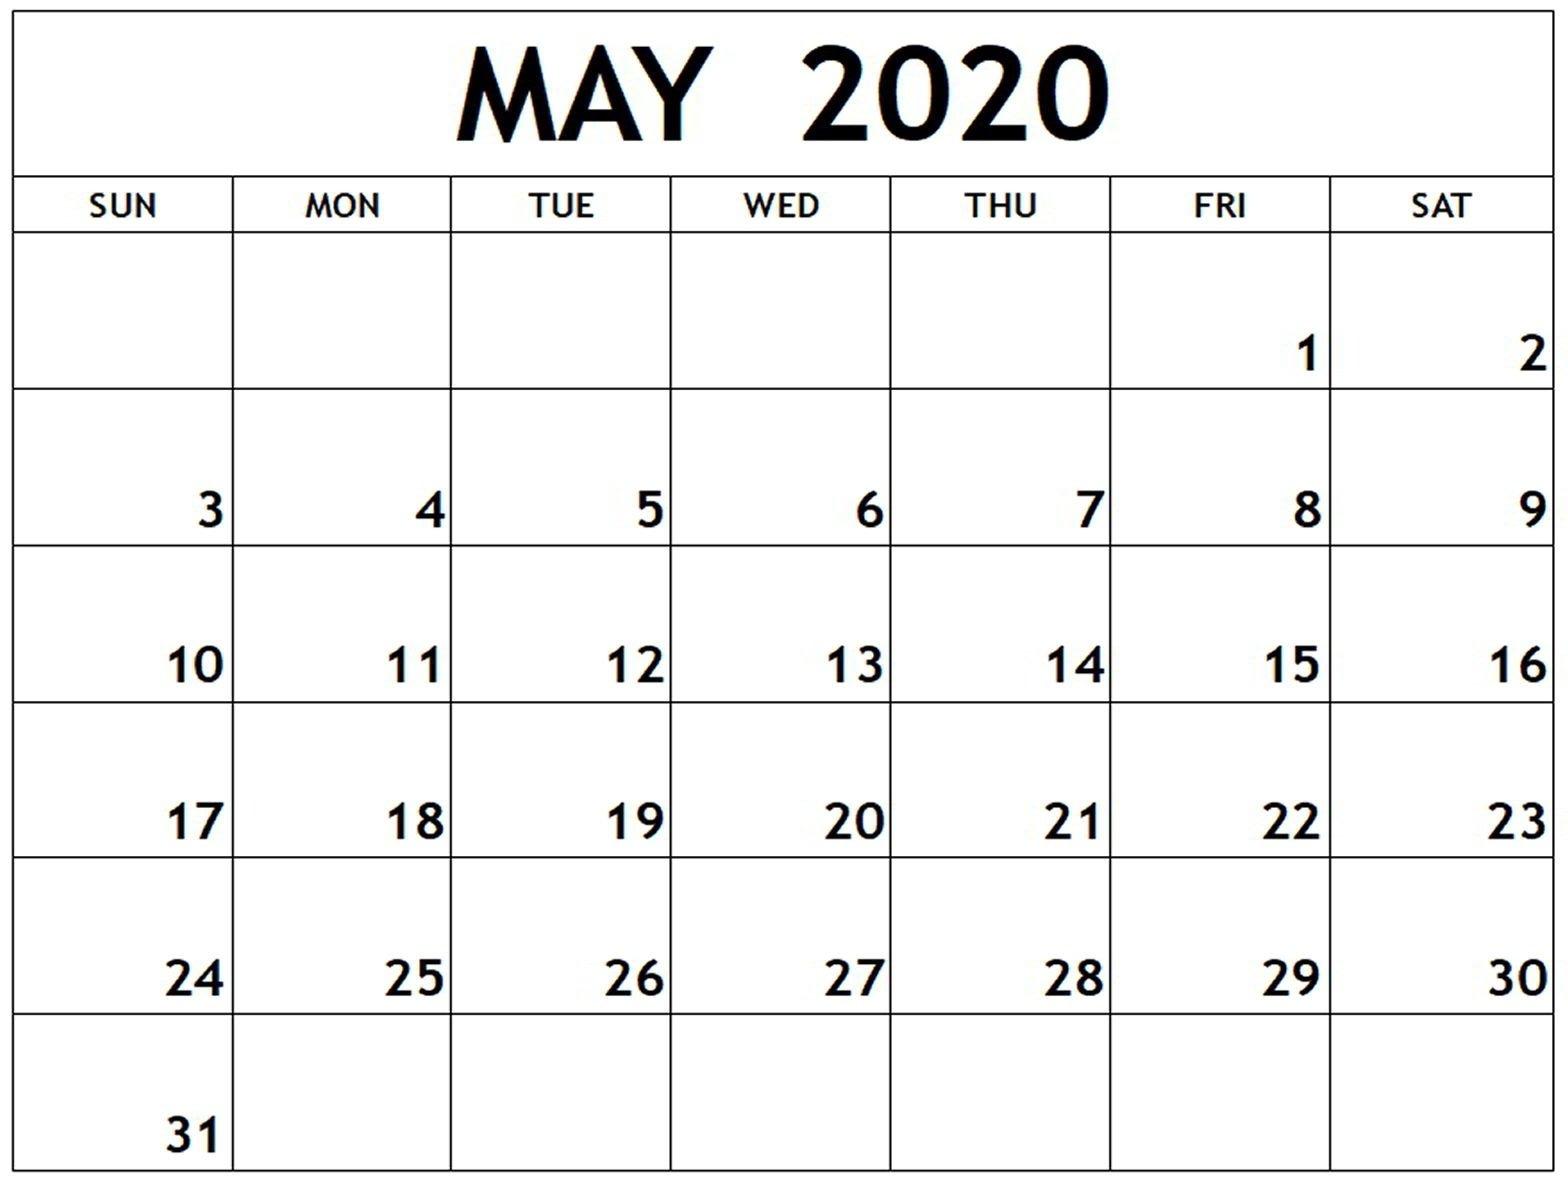 Free Calendar For May 2020   Free Printable Calendar Free Online Printable Calendar Without Downloading